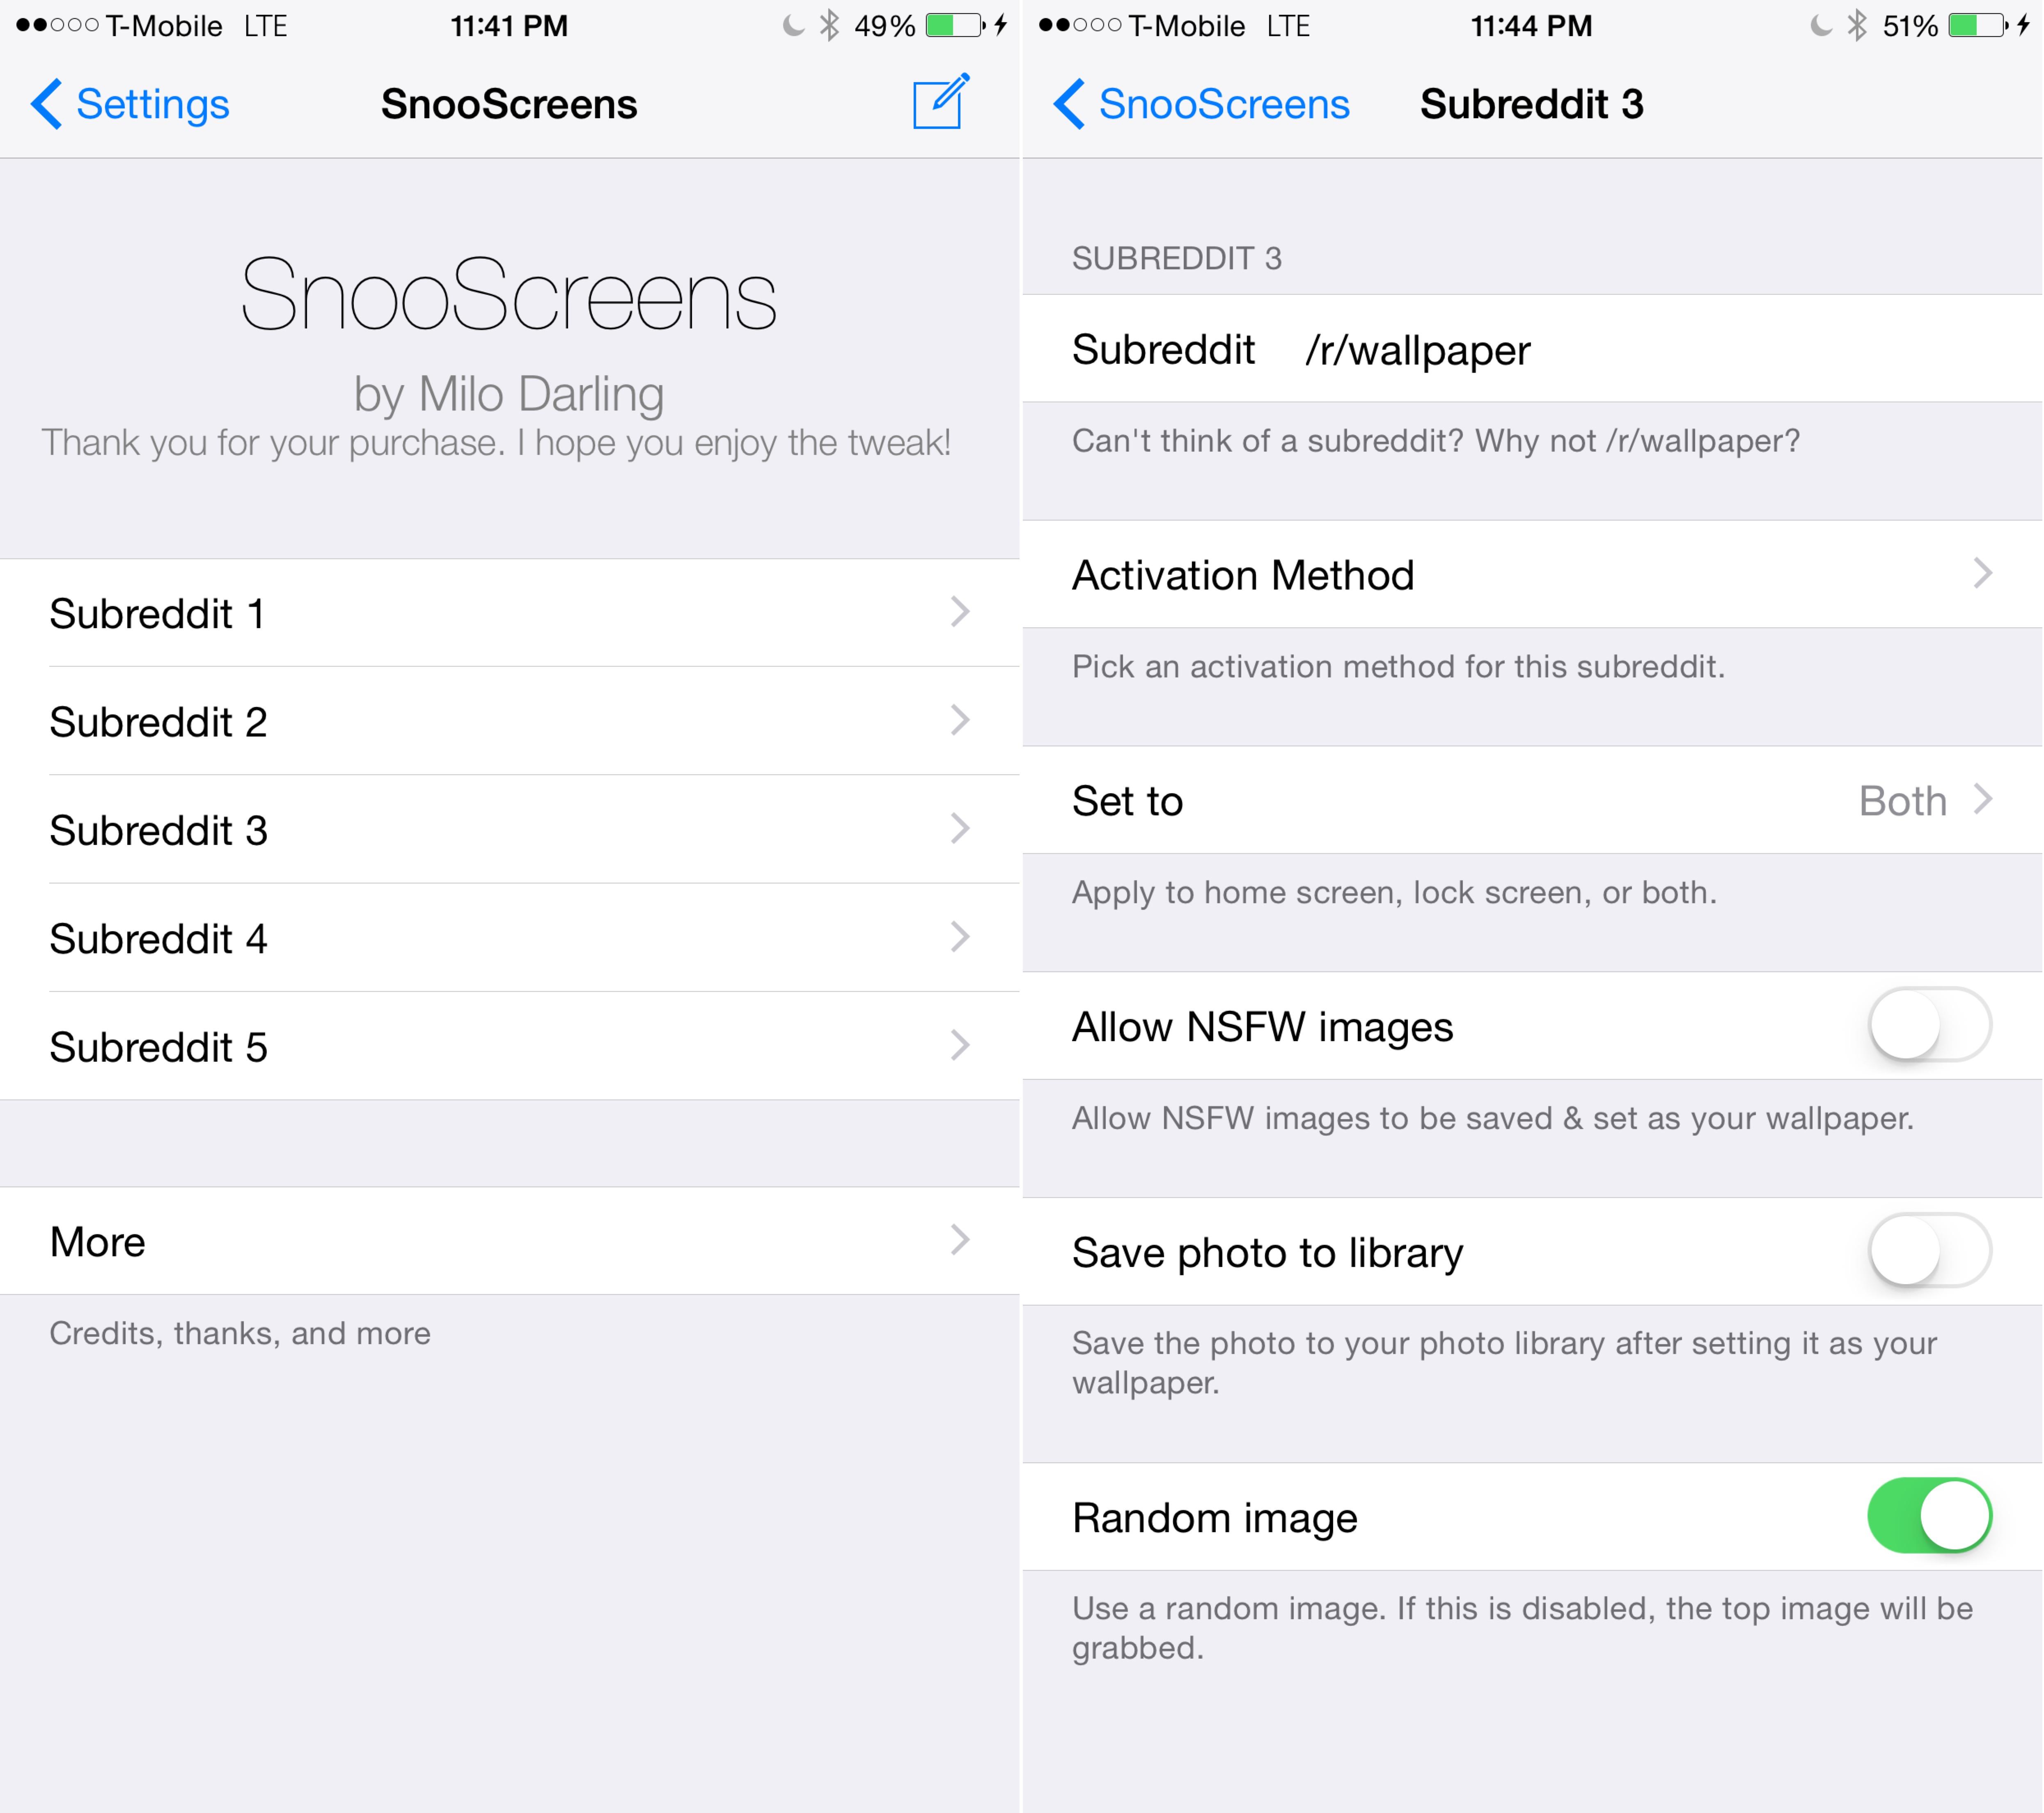 SnooScreens